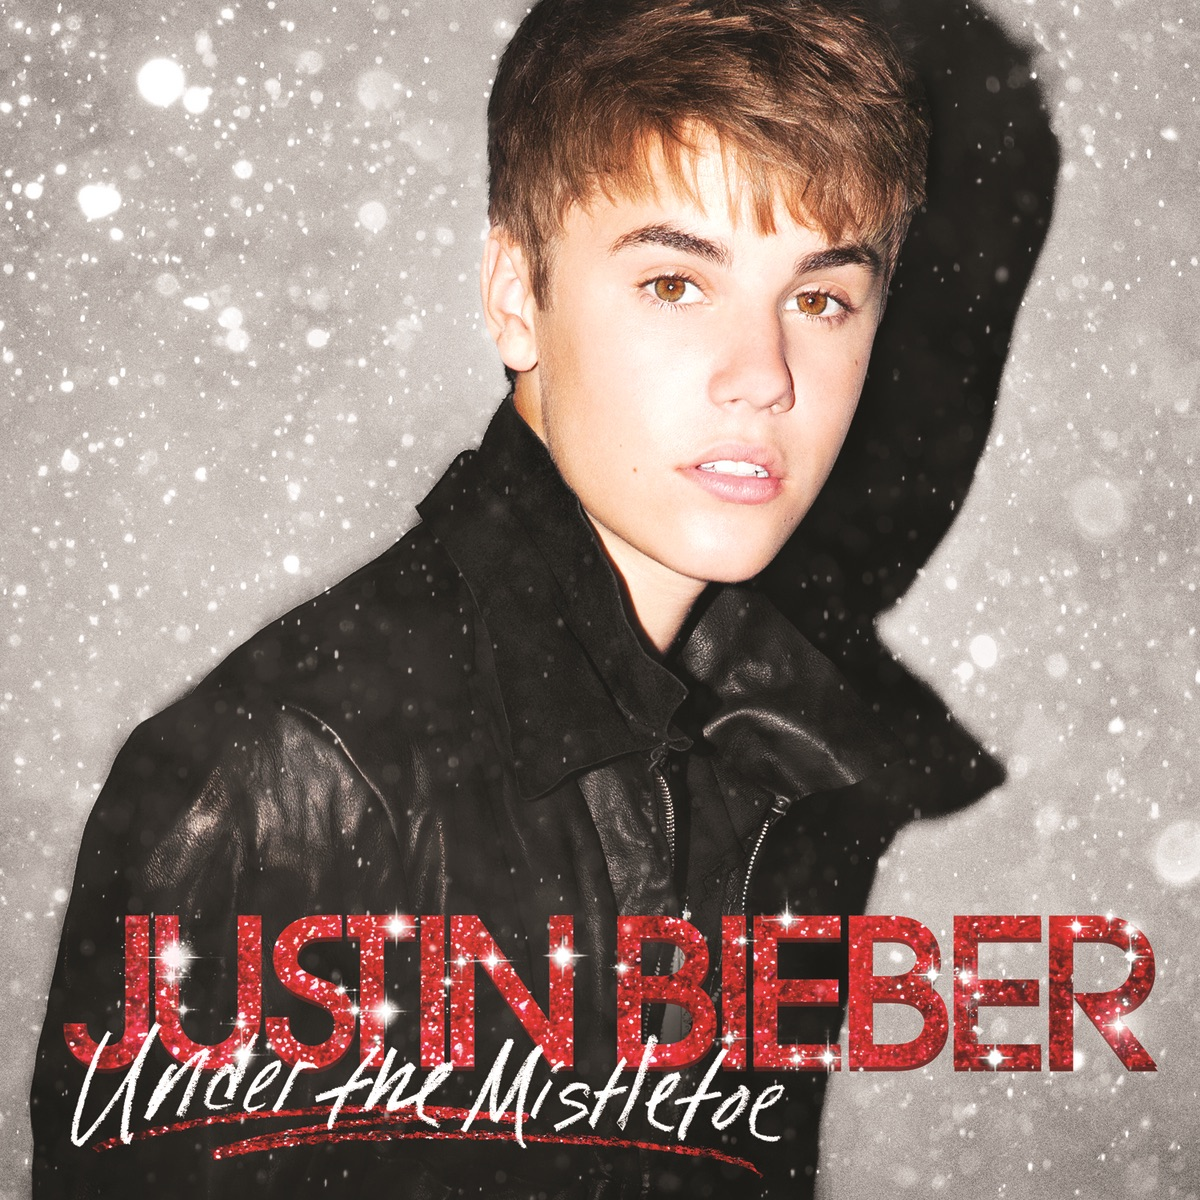 Justin Bieber - Under the Mistletoe (Deluxe Edition)